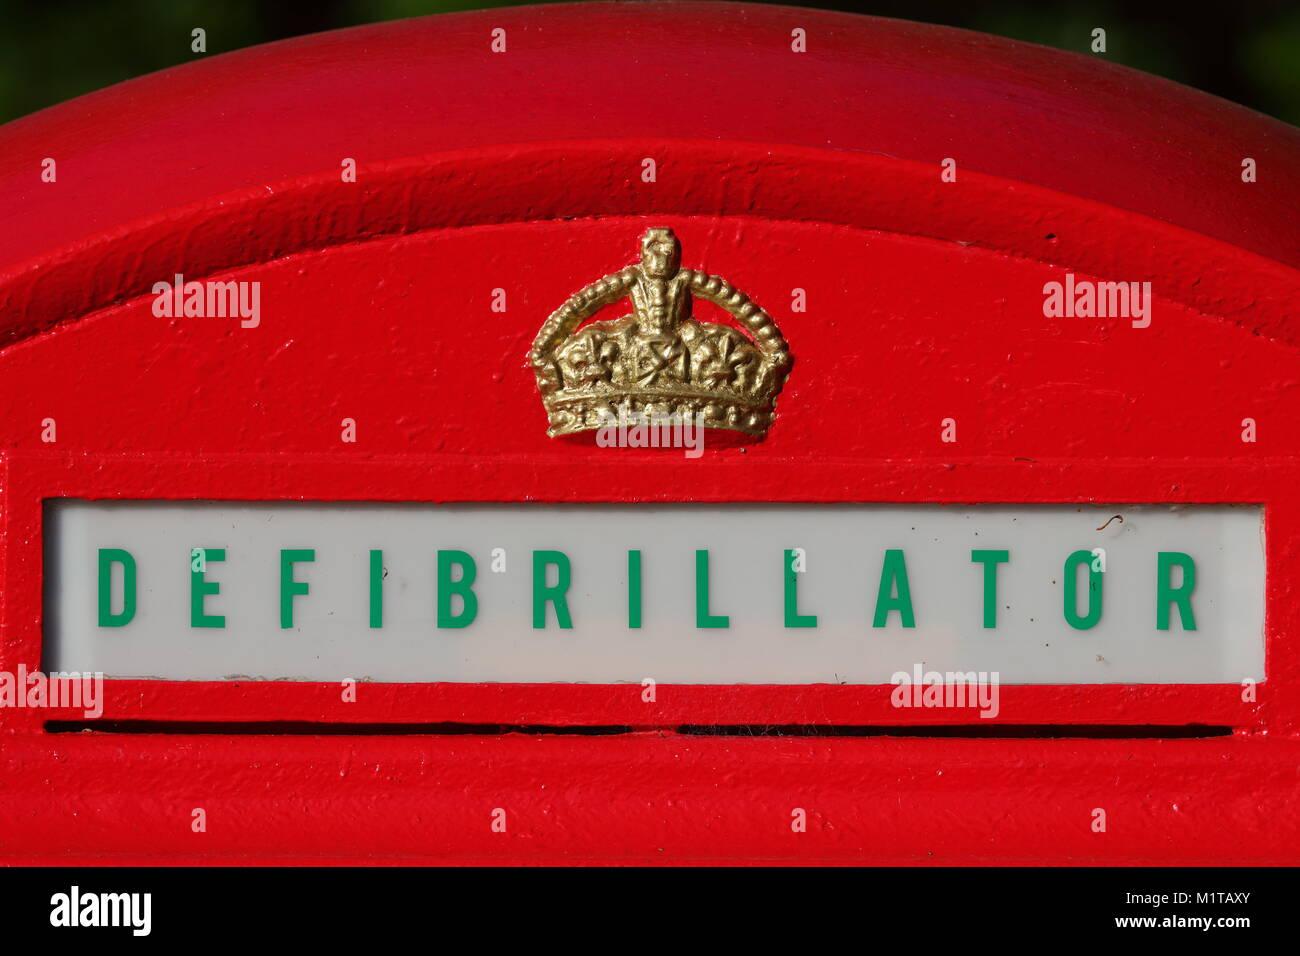 Red Telephone Box Defibrillator - Stock Image